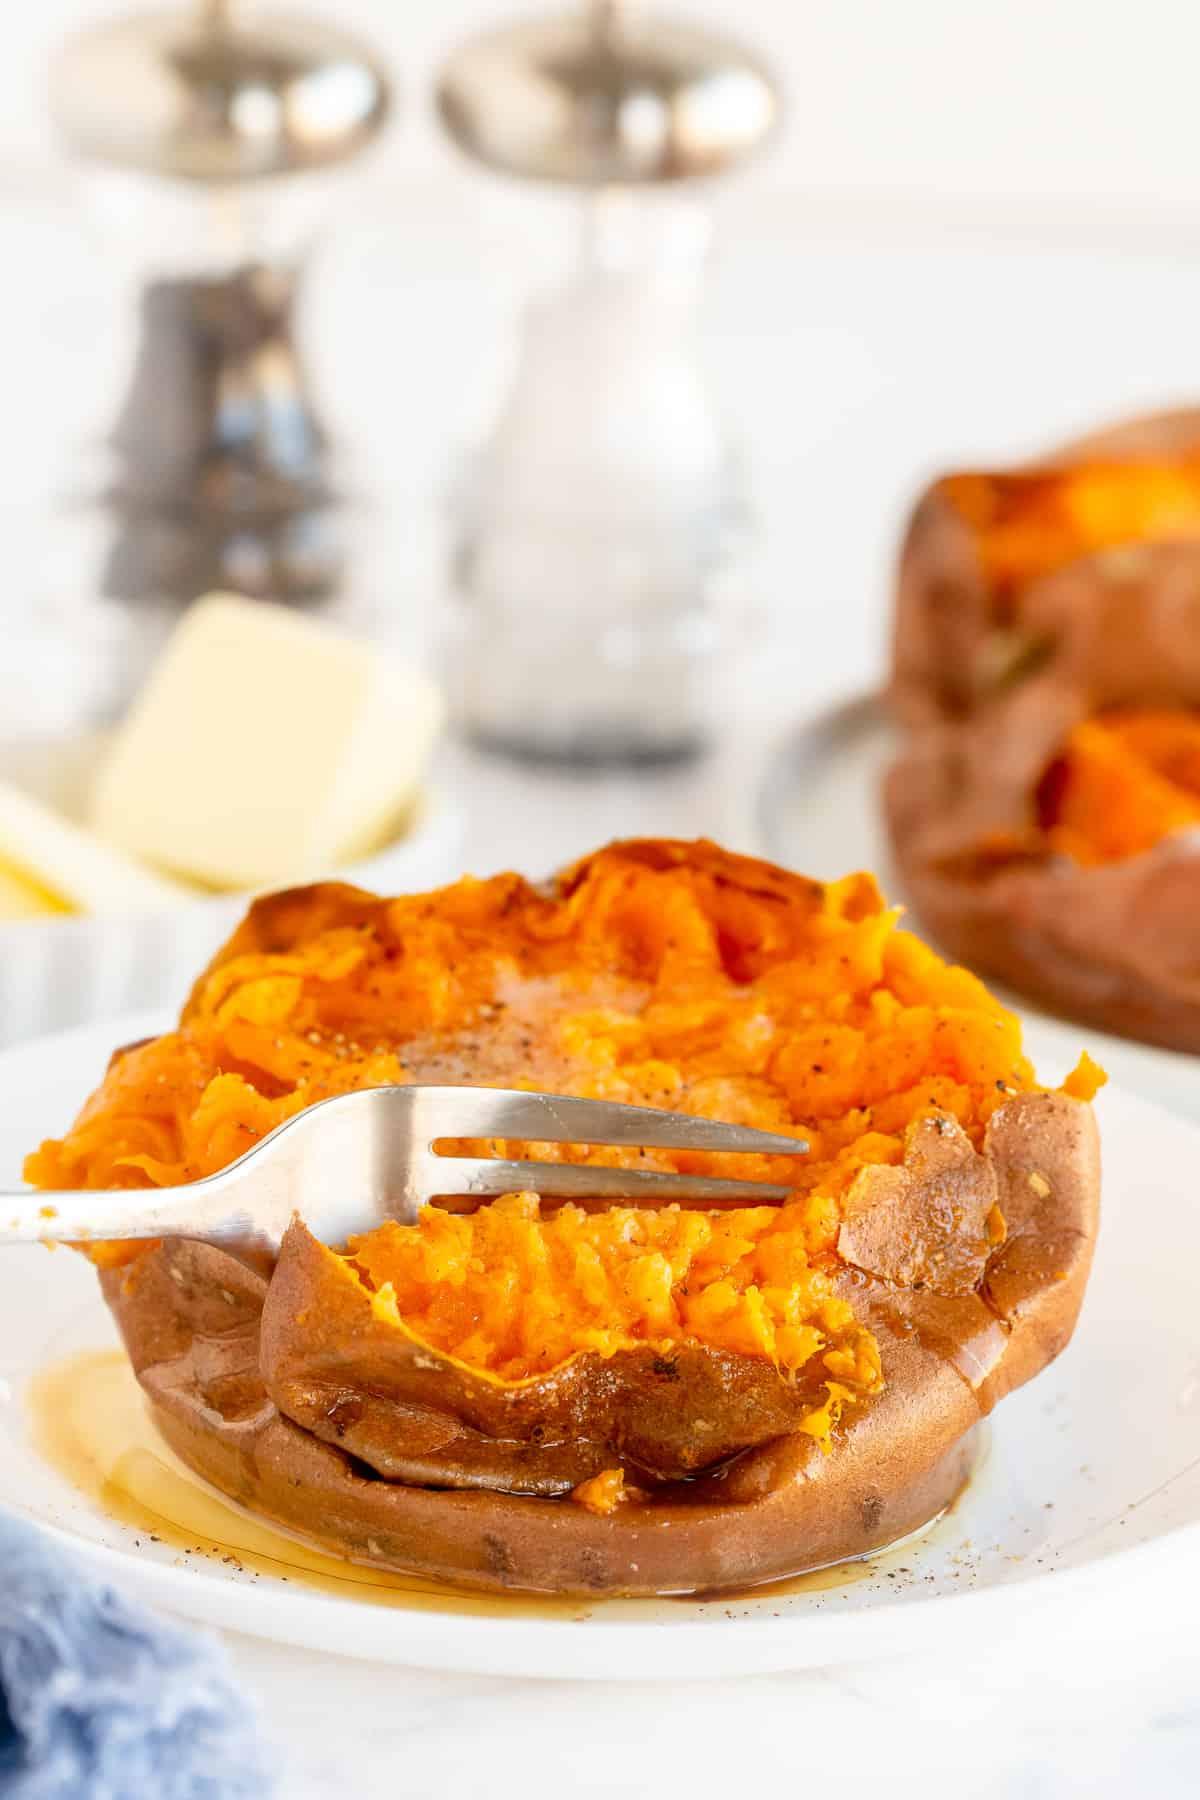 A fork breaks into a baked sweet potato.